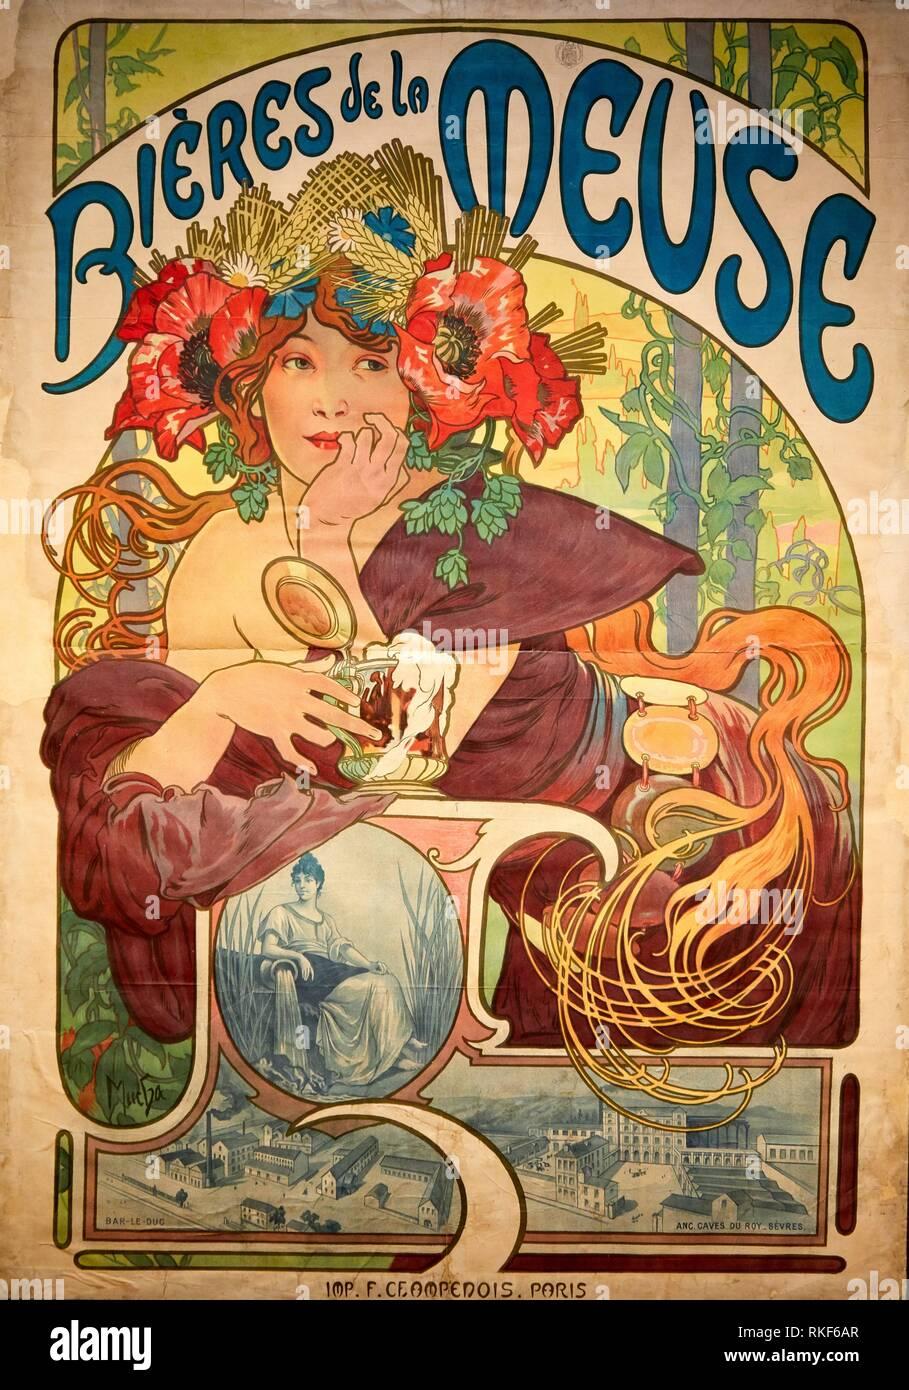 '''Bières de la Meuse'' 1897, Alphonse-Marie Mucha, Museo Nazionale di Arte Catalana, Museu Nacional d'Art de Catalunya MNAC, Barcellona, Spagna, Europa Immagini Stock